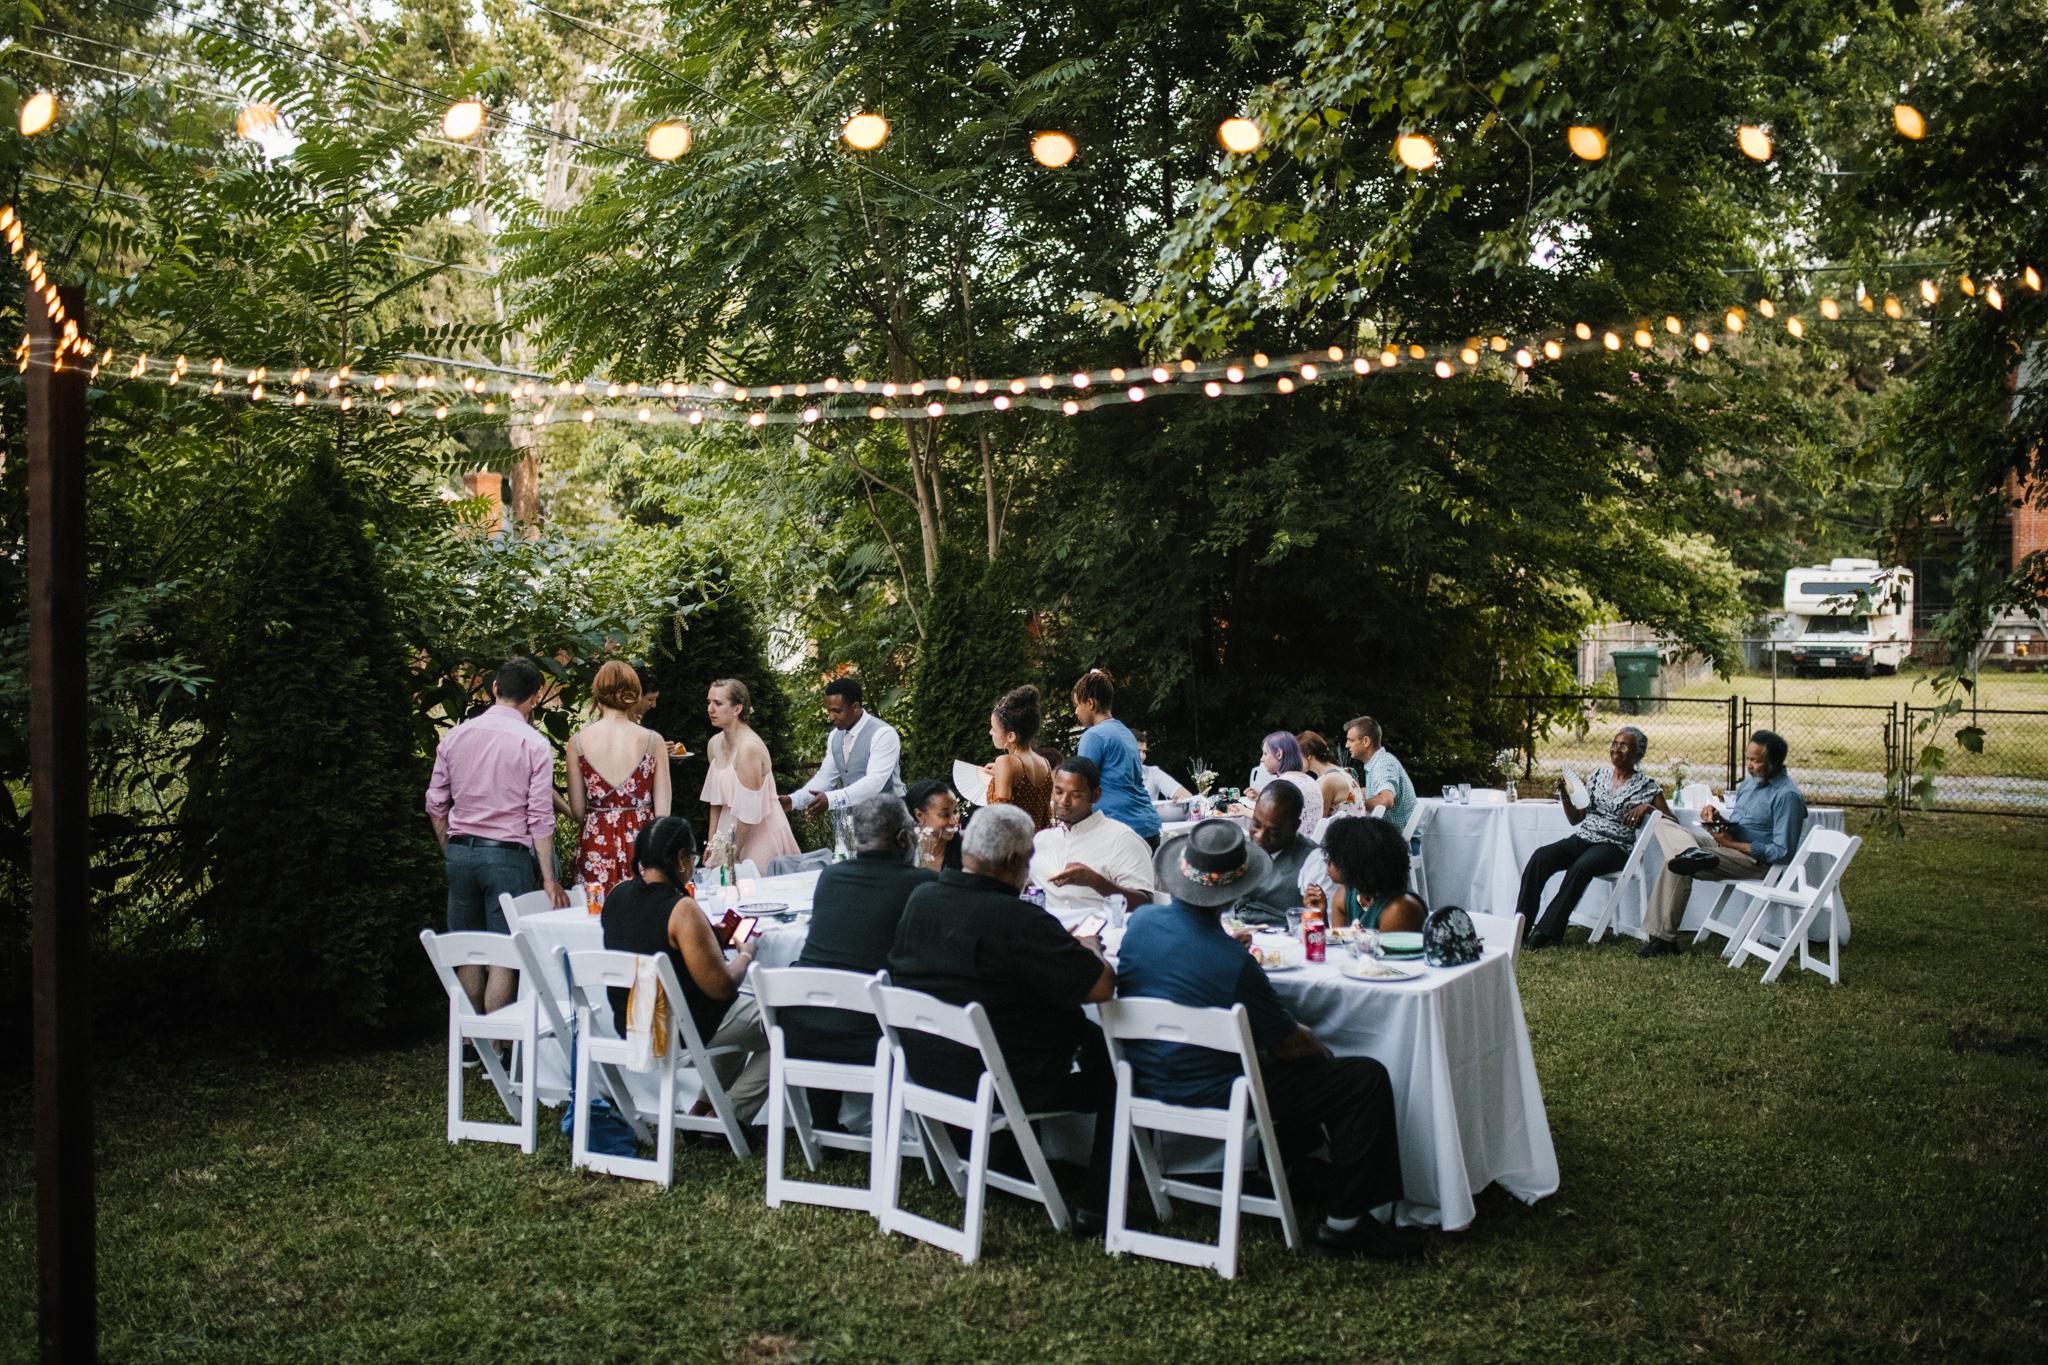 dorota_dwight_richmond_backyard_wedding-107.jpg